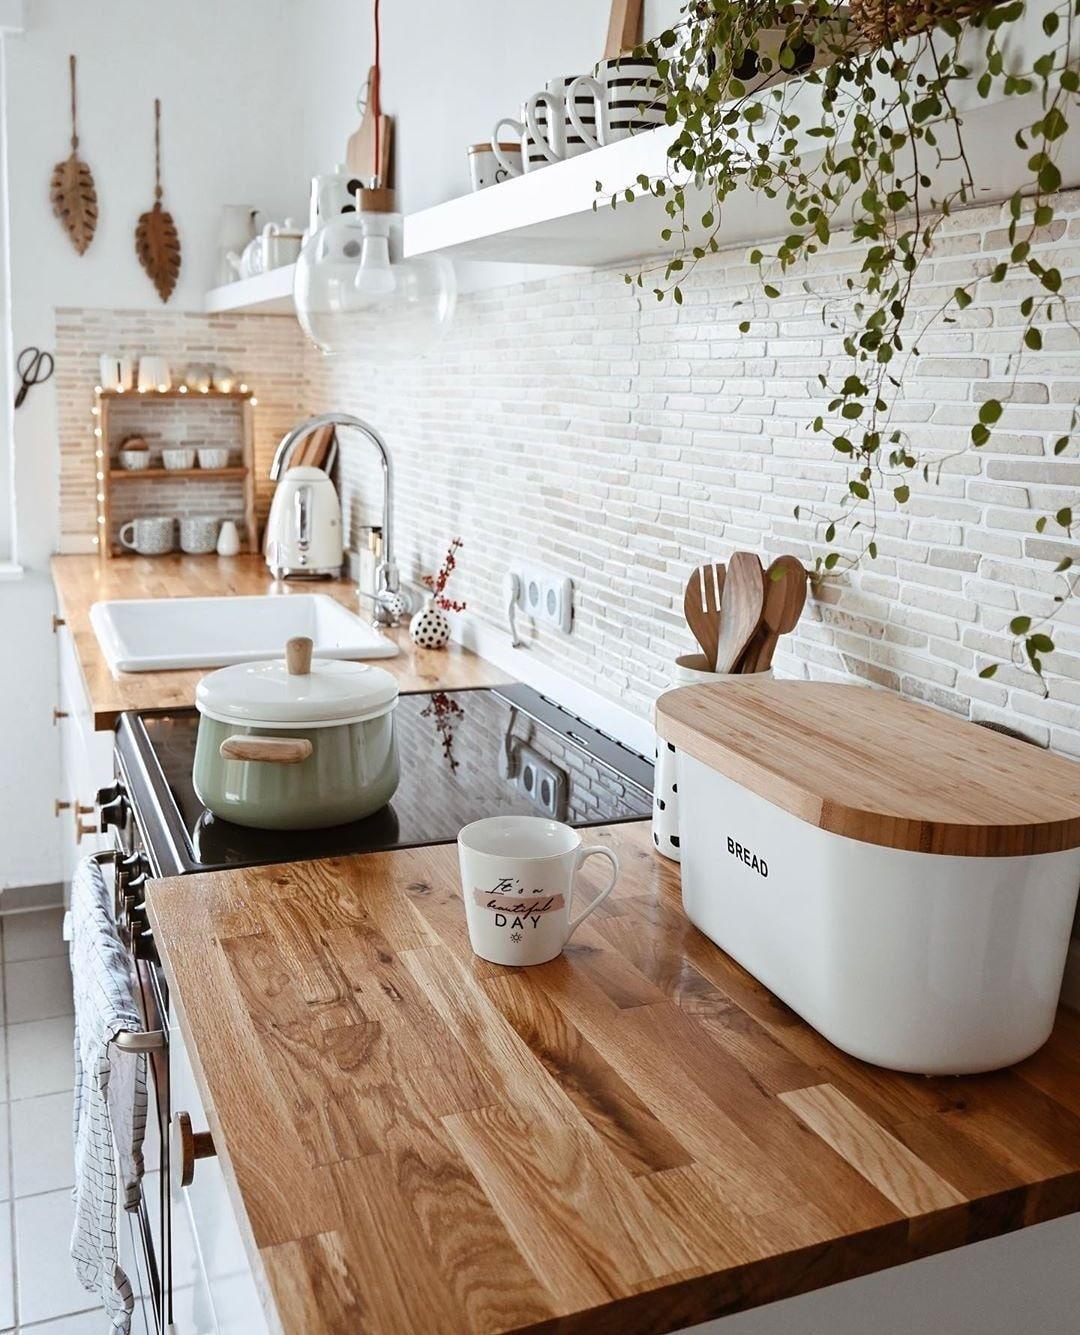 Desain Interior Dapur Minimalis Dengan Style Vintage Klasik